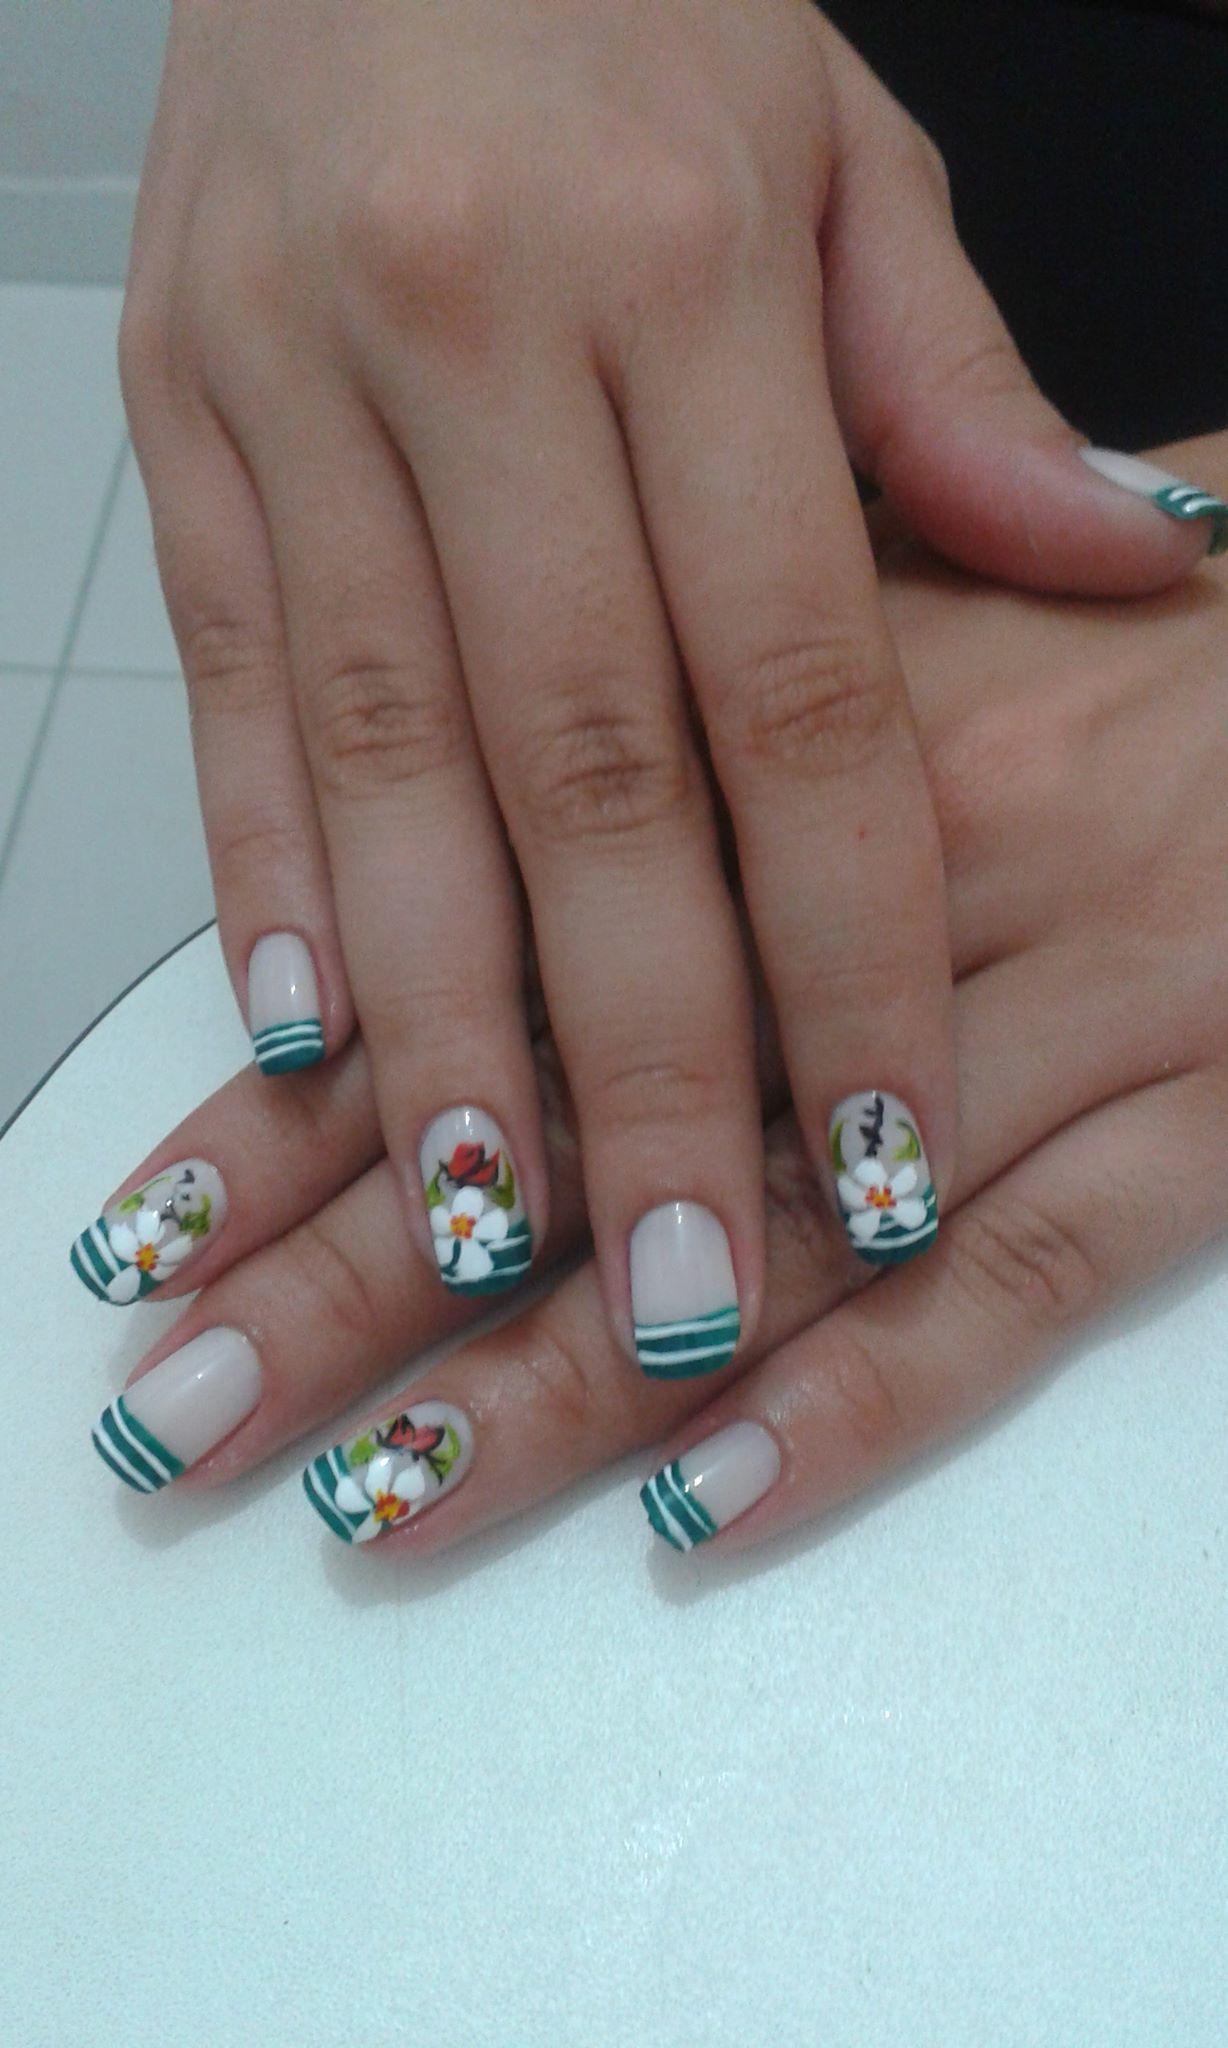 francesinha verde, floral, rosas brancas, dia, festa unhas  manicure e pedicure manicure e pedicure